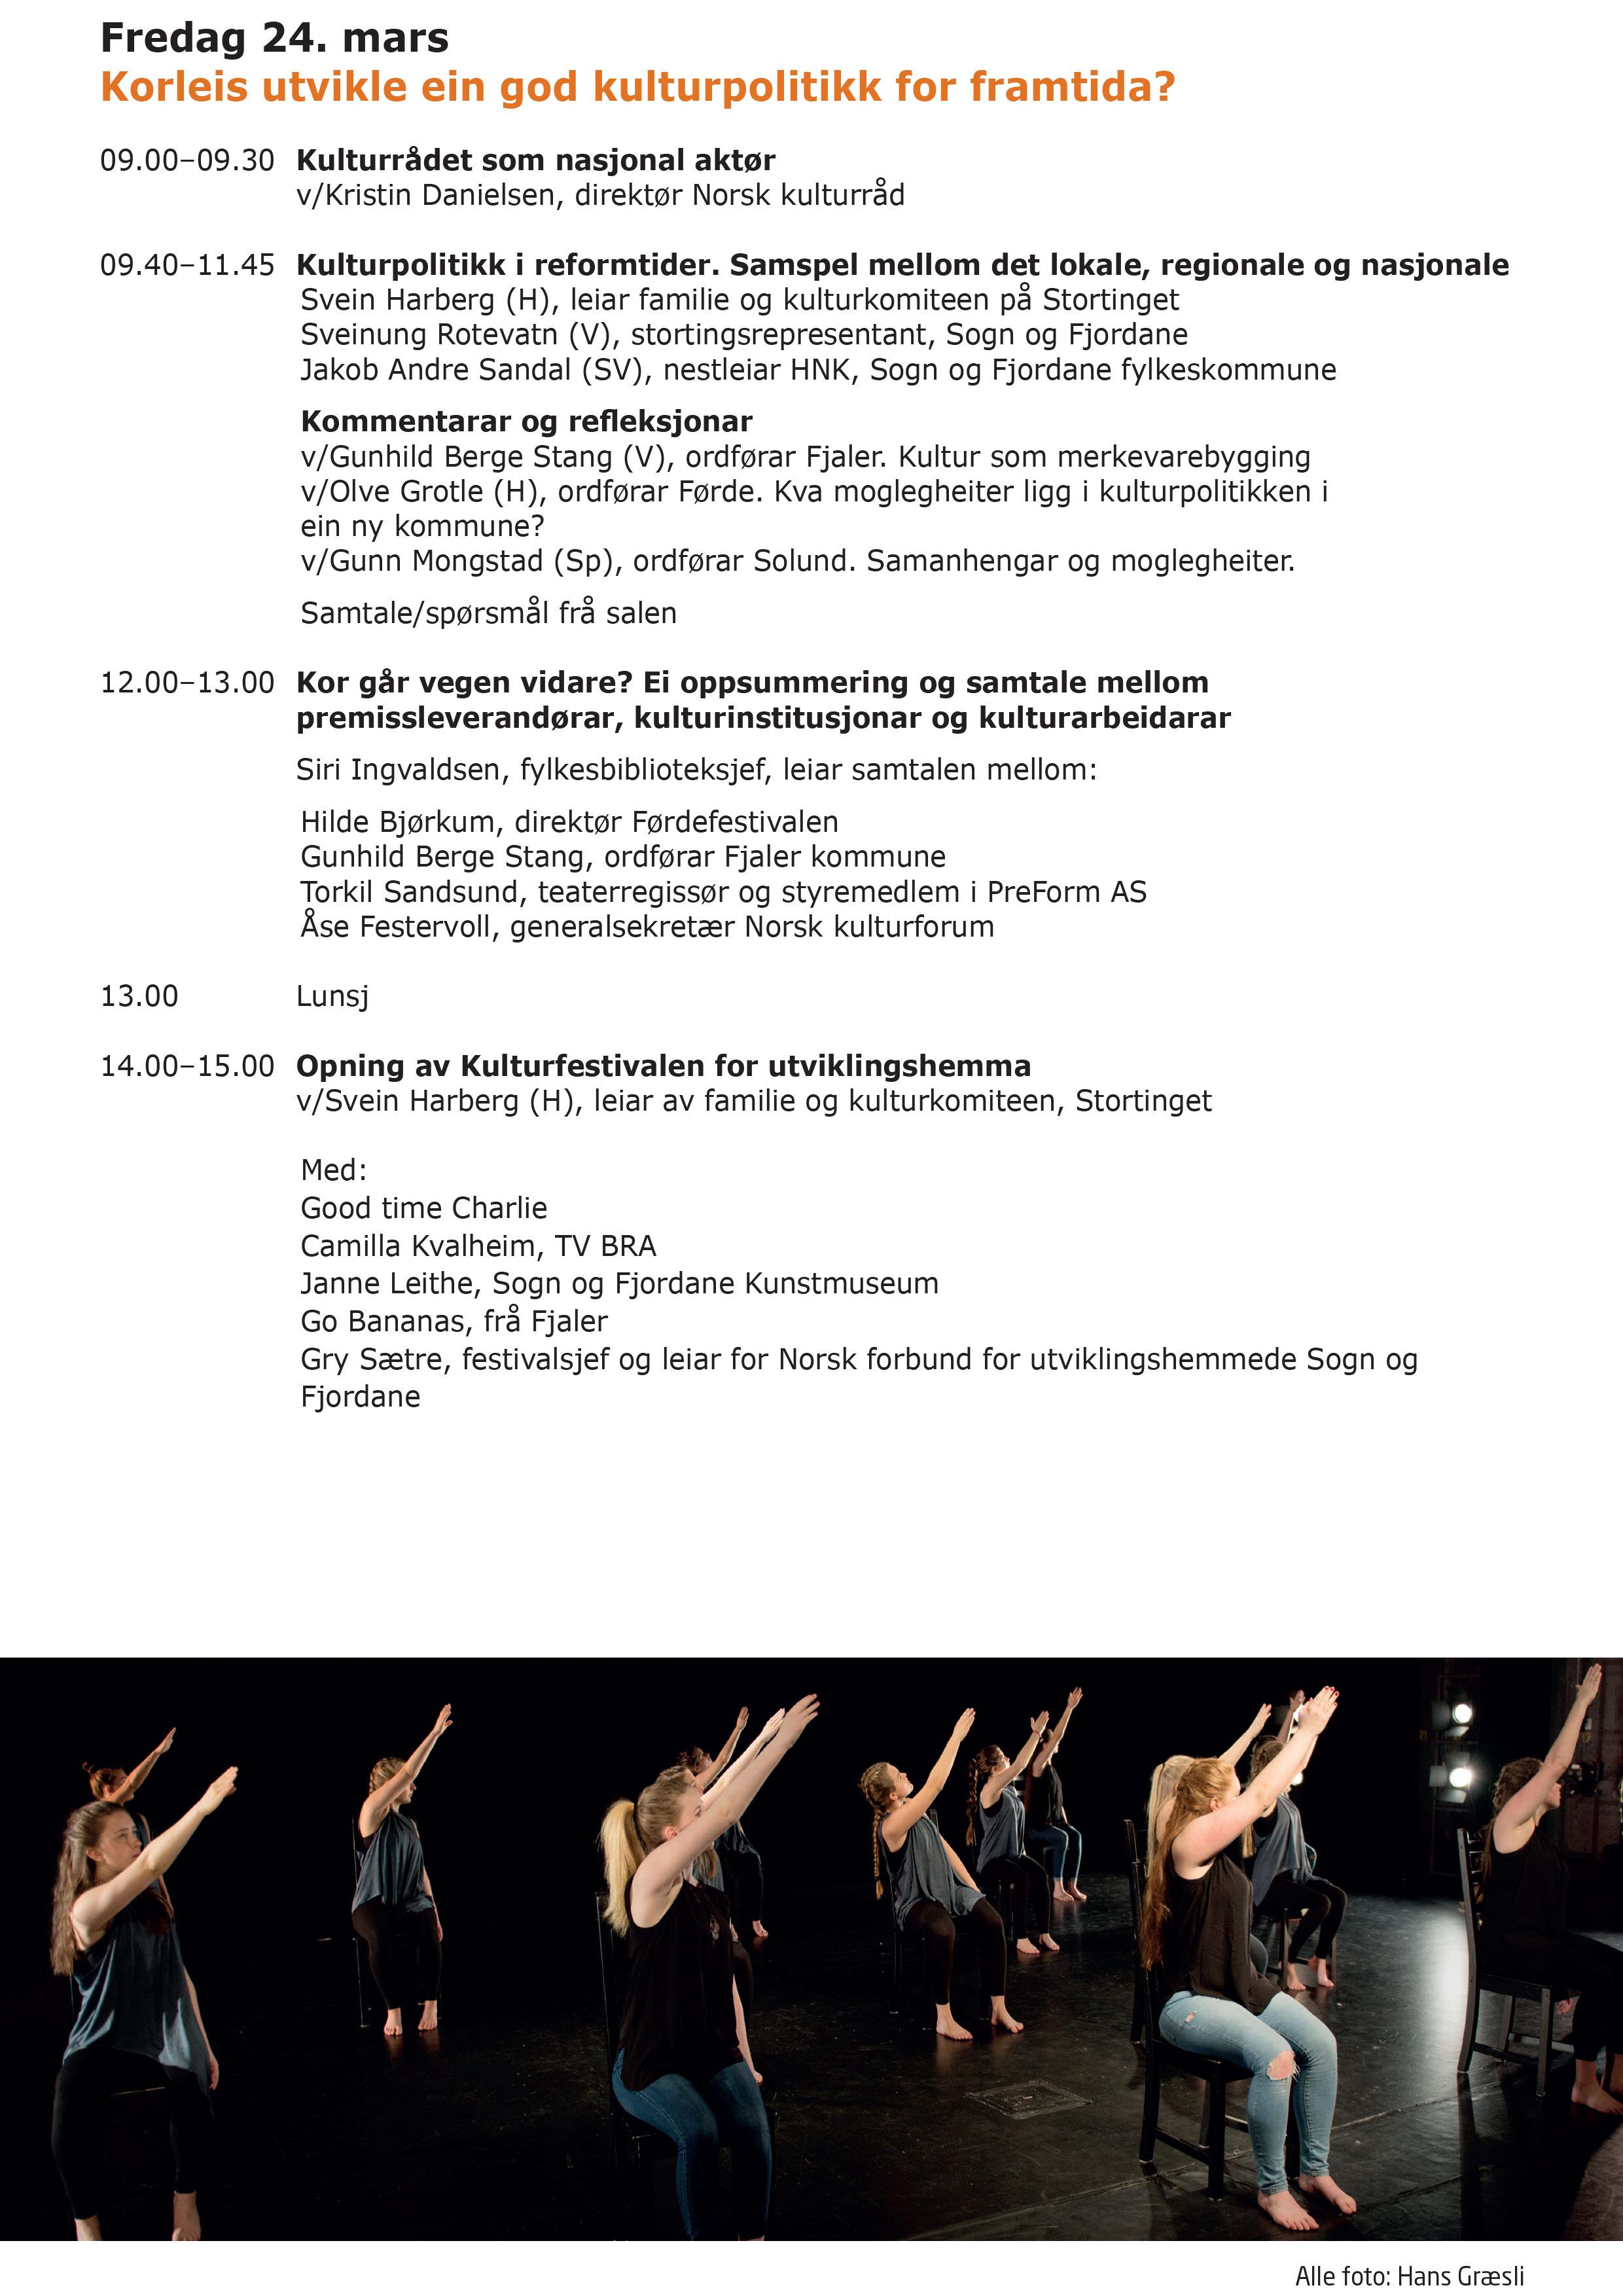 Program_kulturkonferansen 2017_fredag 24.03